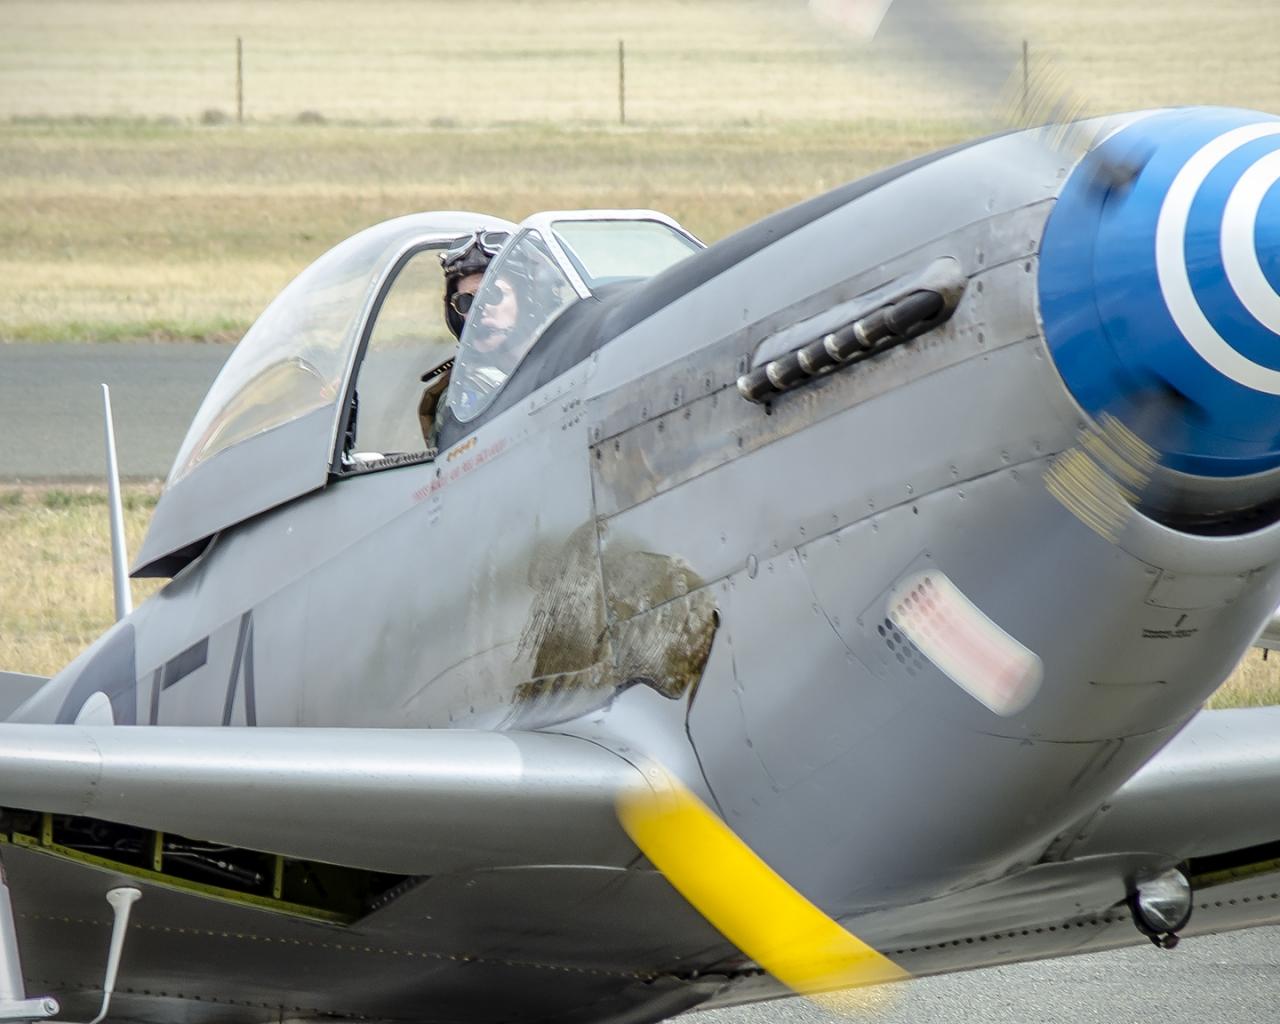 Avionetas  P-40N - 1280x1024